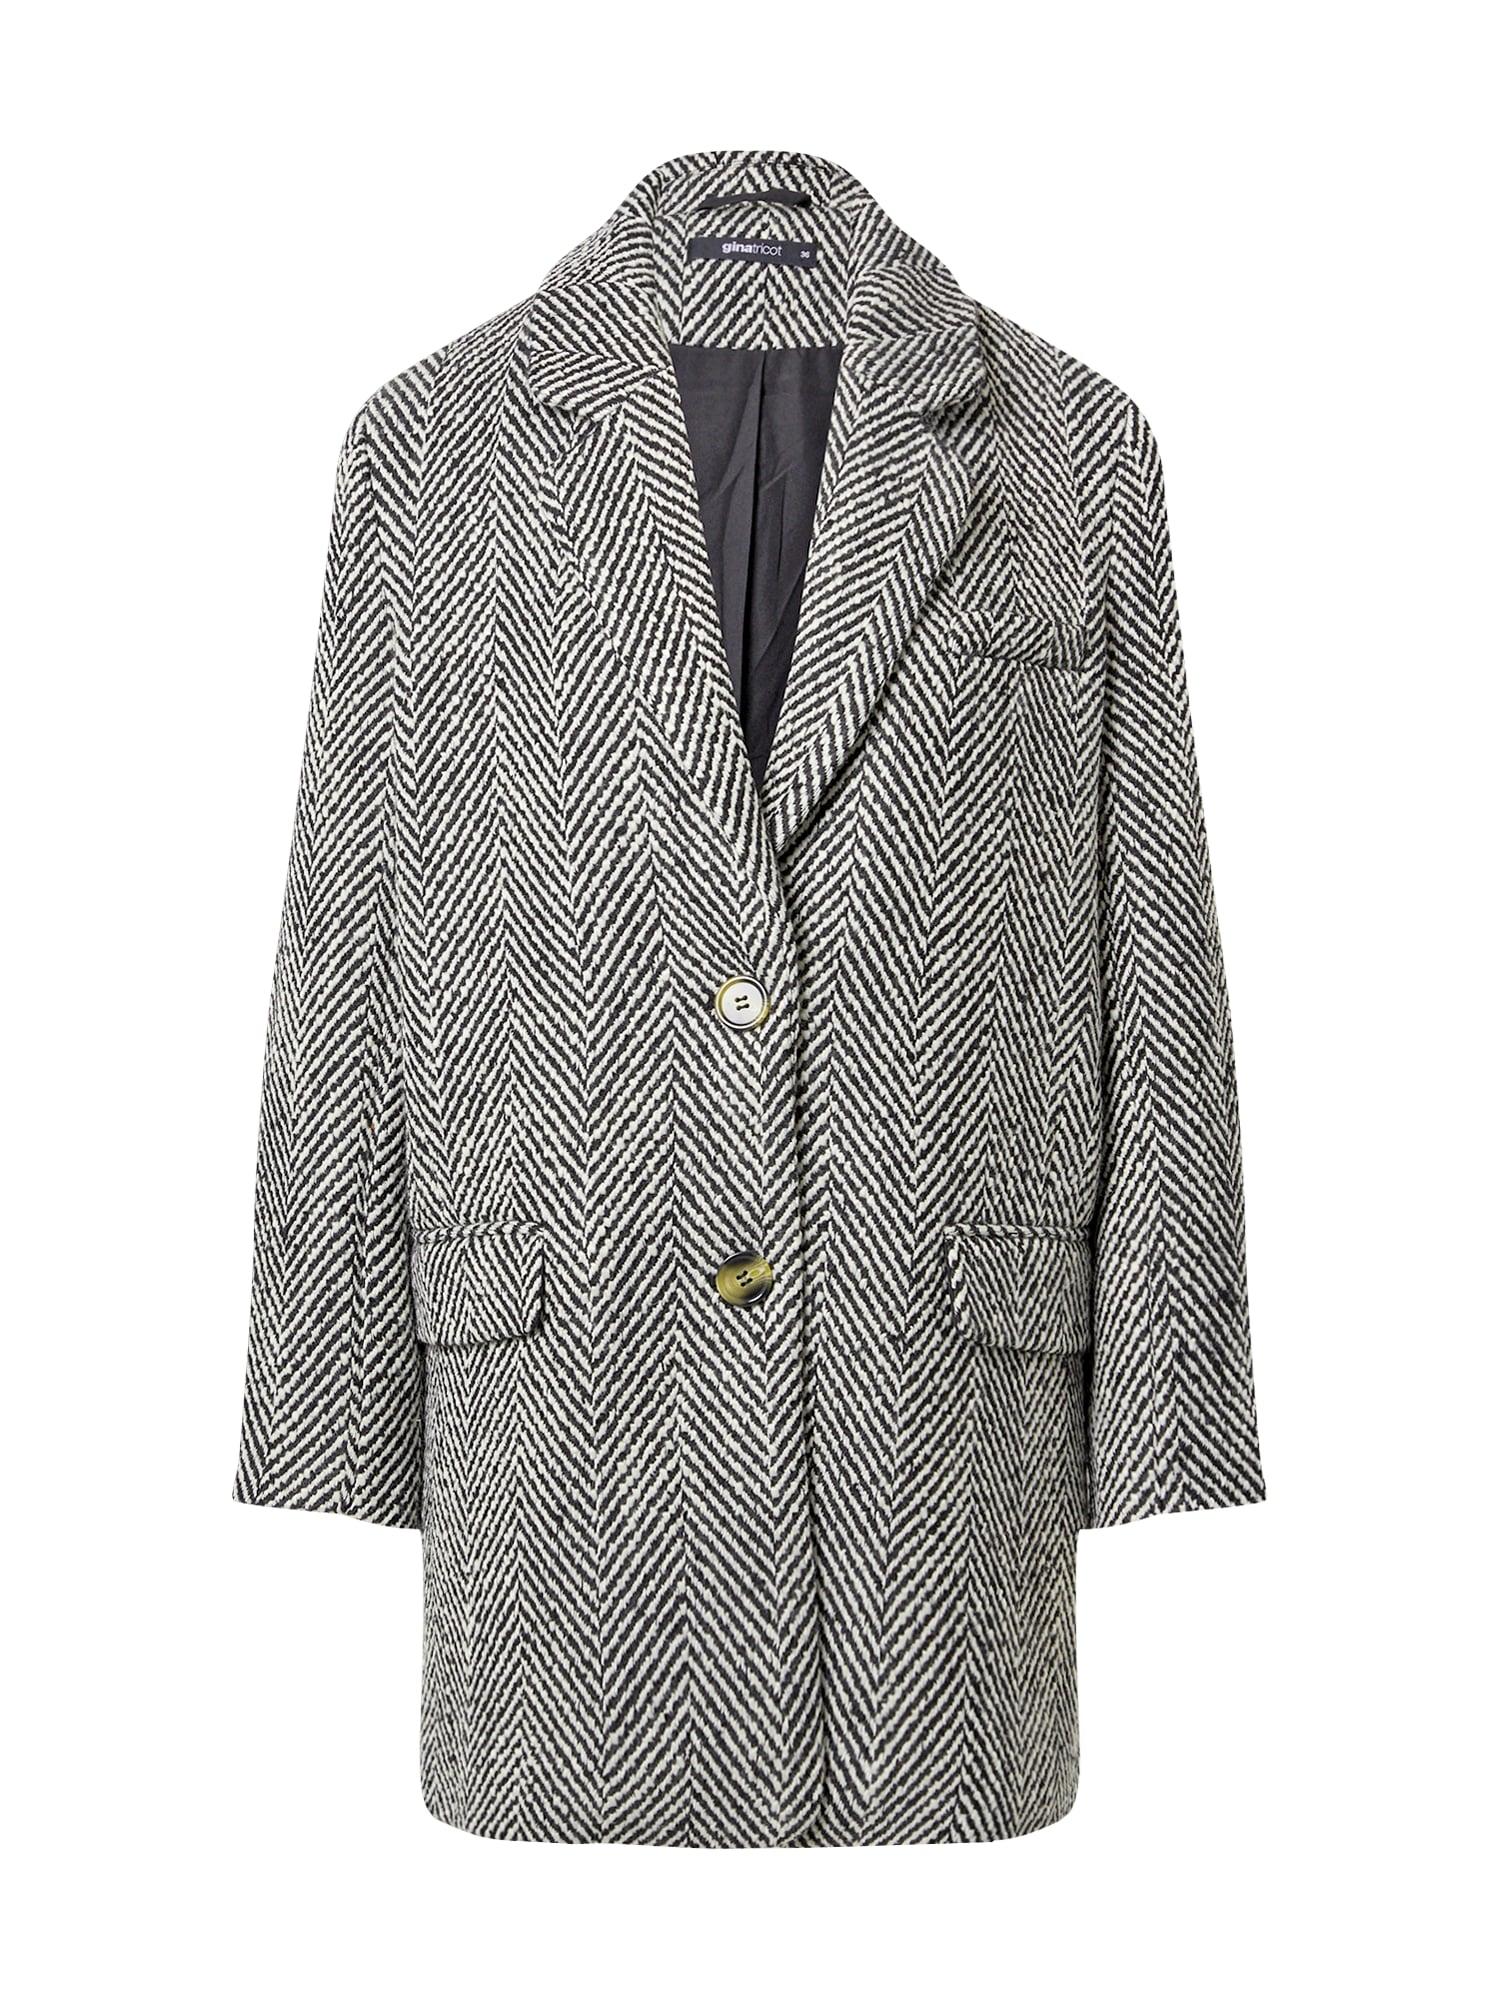 Gina Tricot Demisezoninis paltas juoda / balta